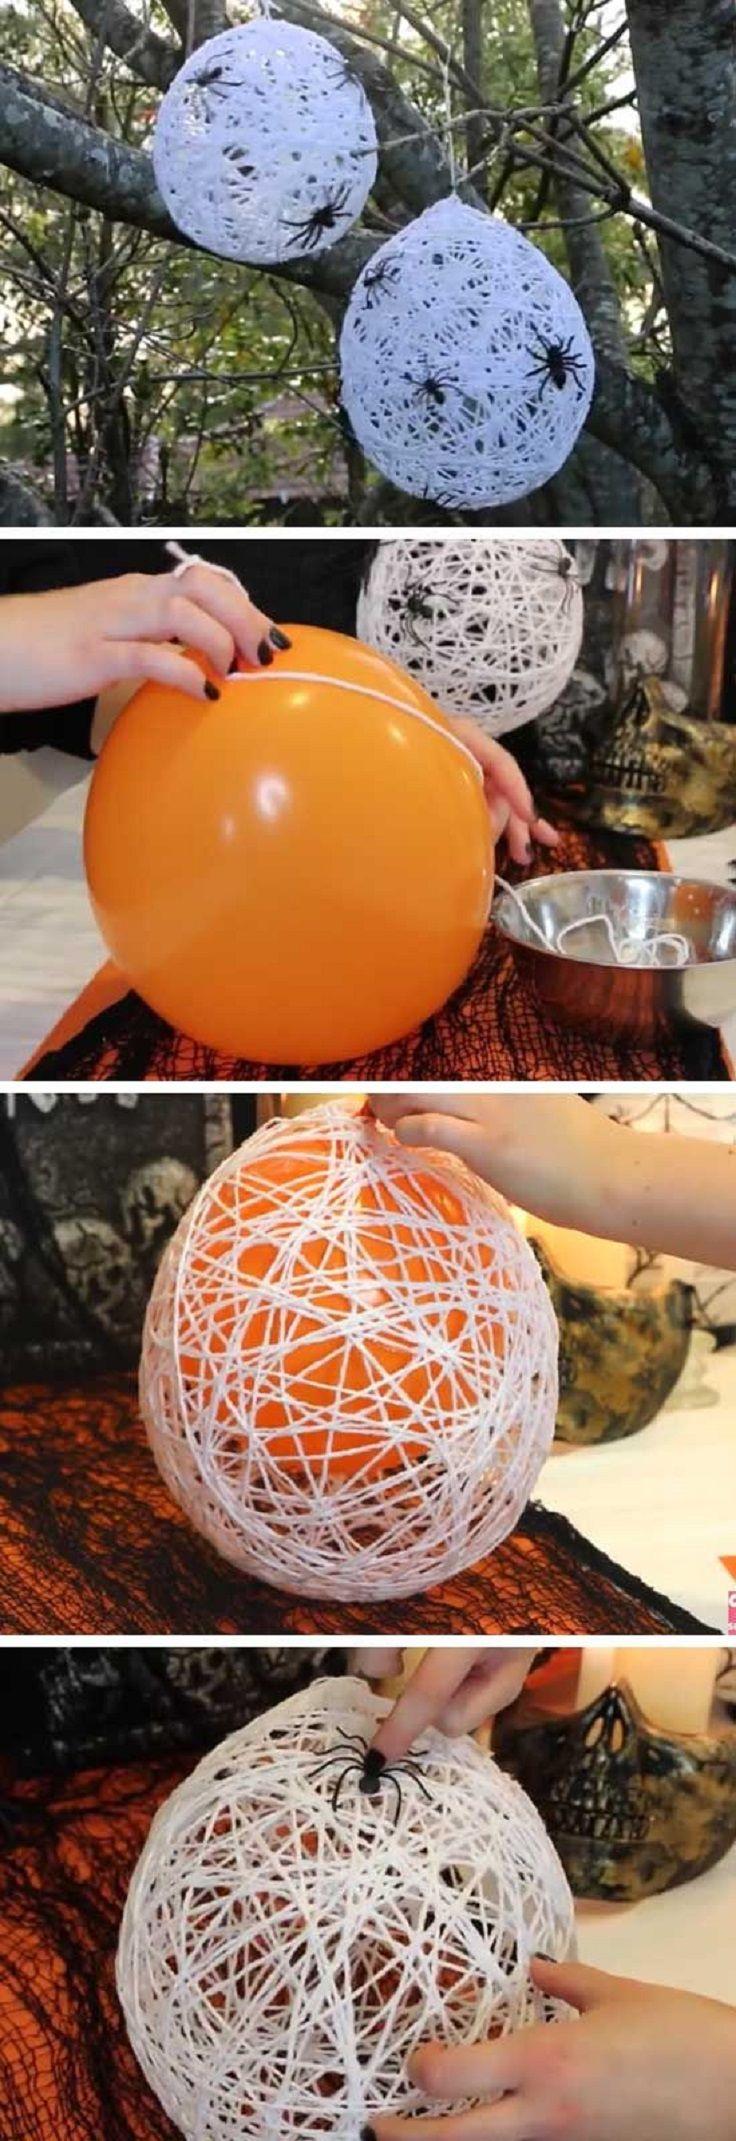 Balloon Spider Web DIY Halloween Decoration Tutorial - Blood-Curdling DIY Halloween Decoration To Add A Decor Your Neighborhood Will Remember